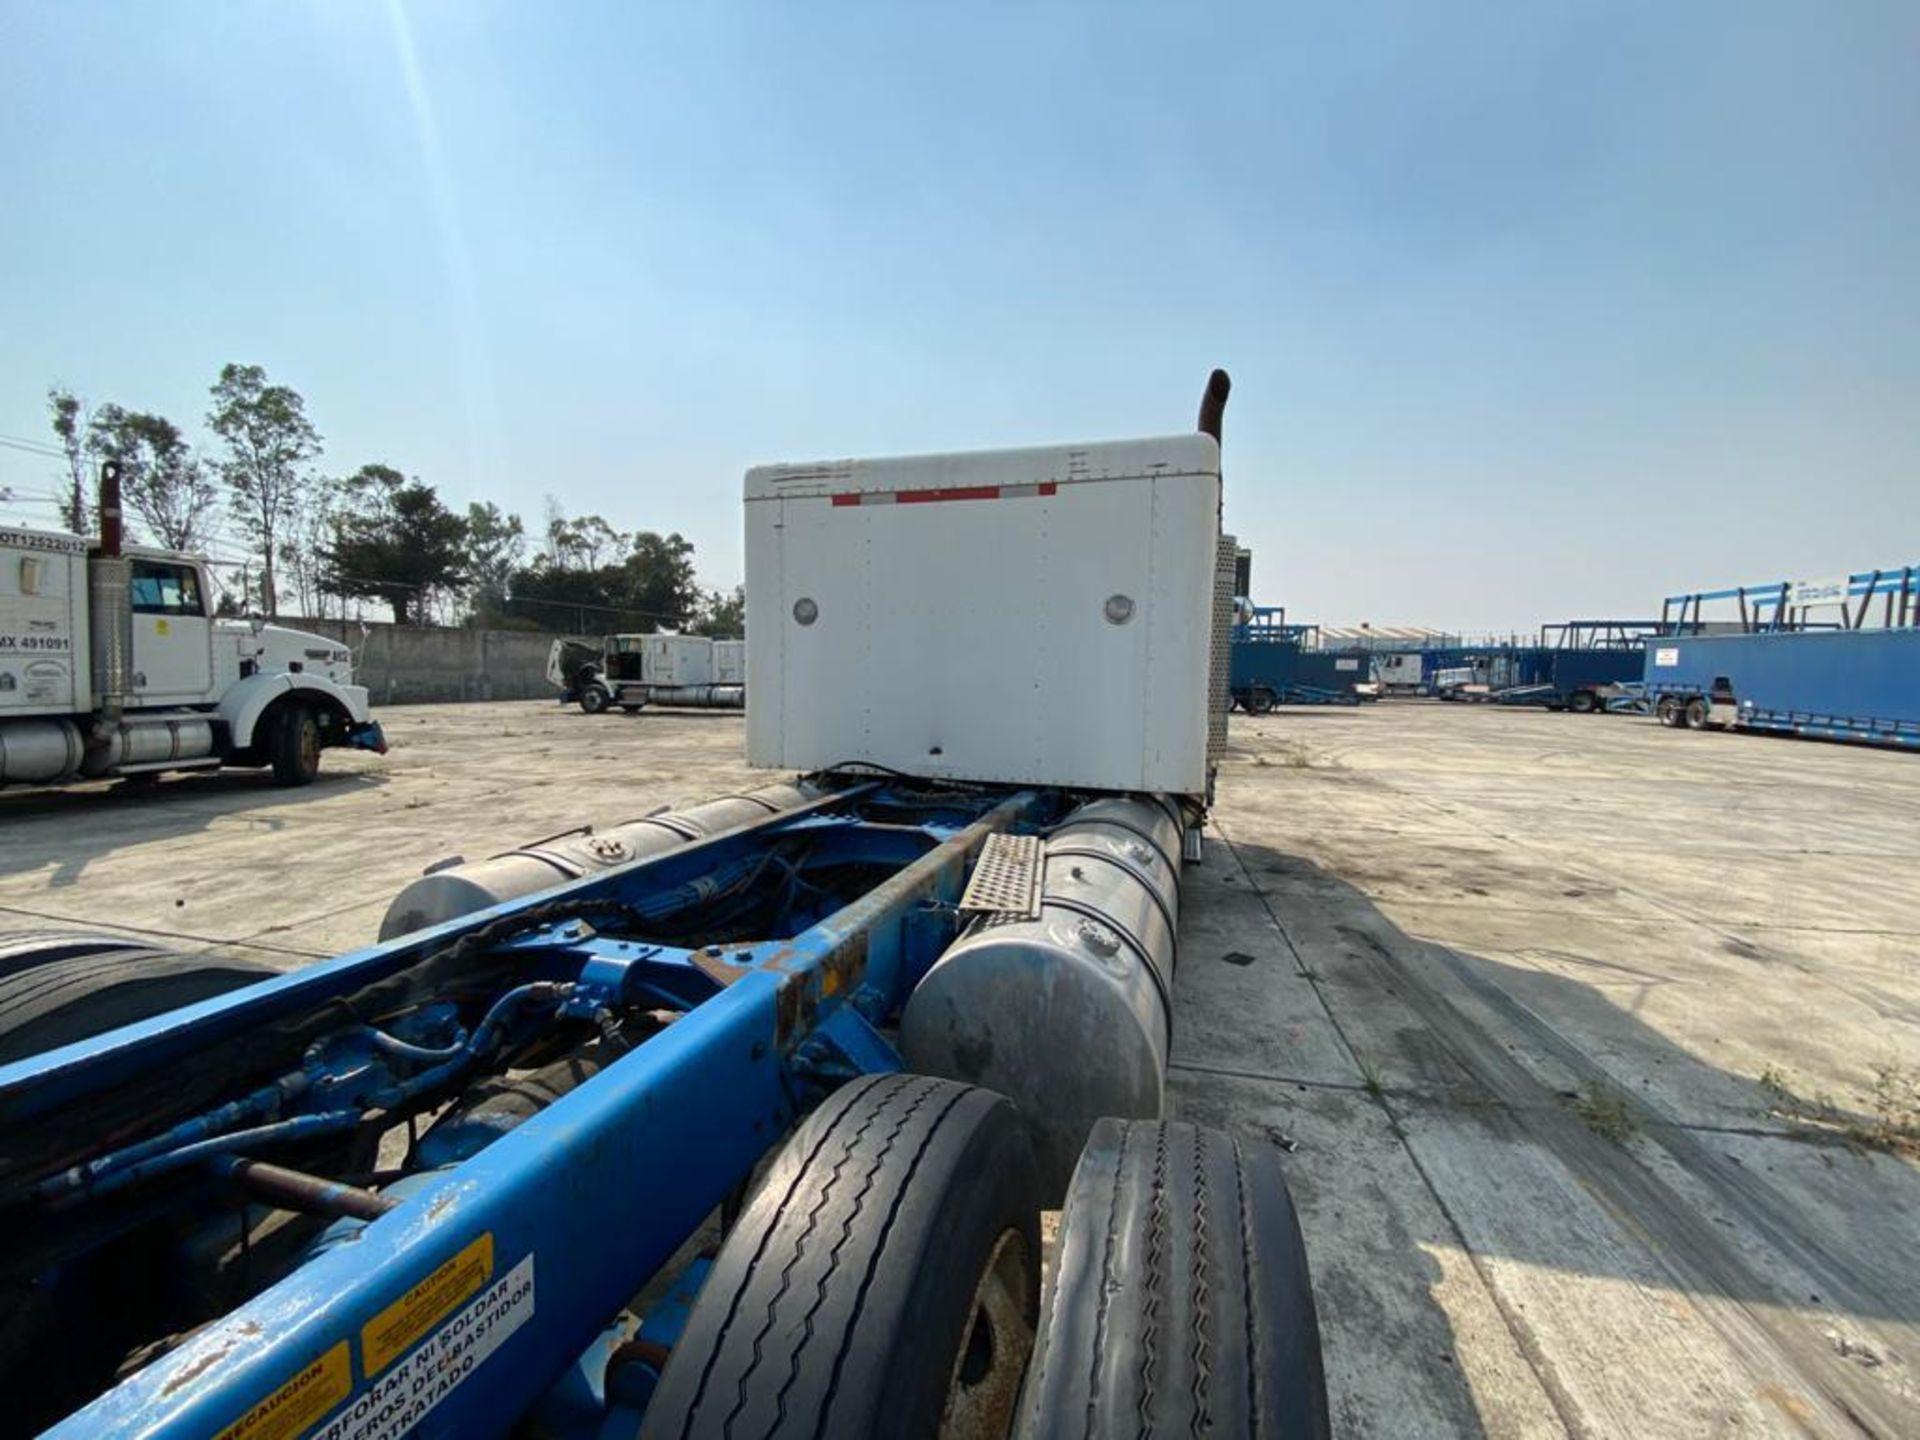 1999 Kenworth Sleeper truck tractor, standard transmission of 18 speeds - Image 28 of 75